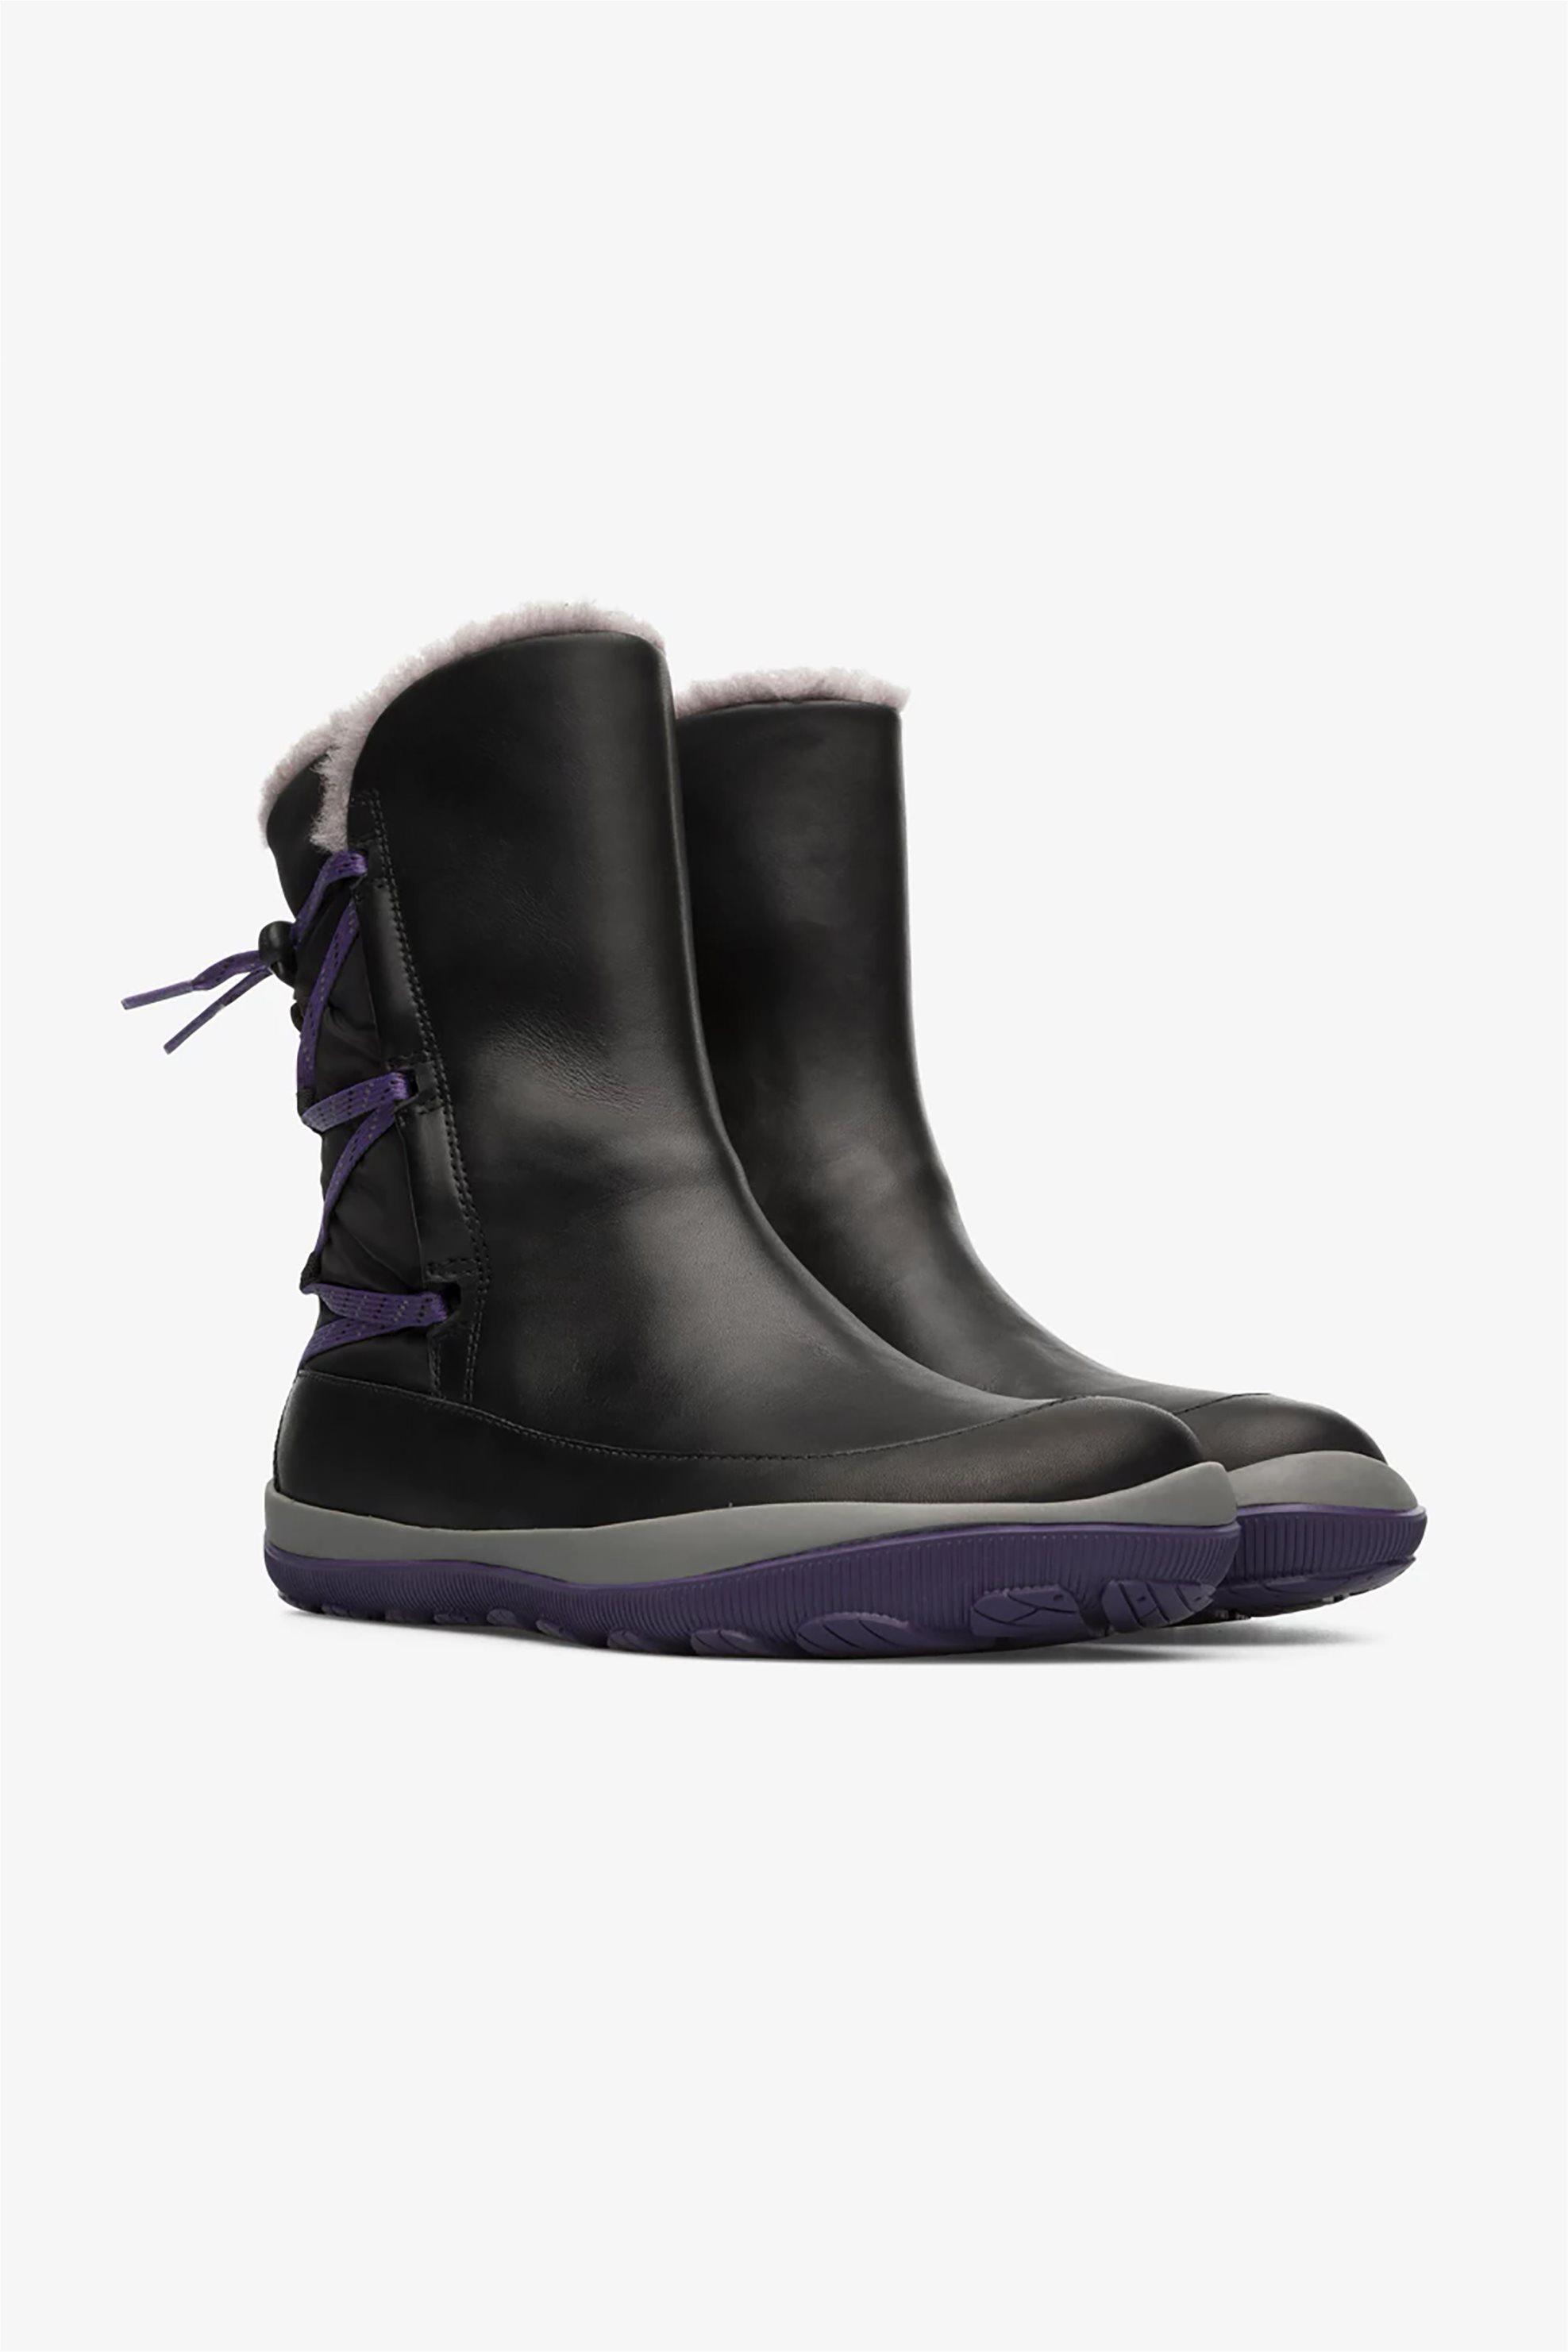 Camper γυναικείες μπότες με γούνινη επένδυση «Peu Pista» – K400386-001 – Μαύρο